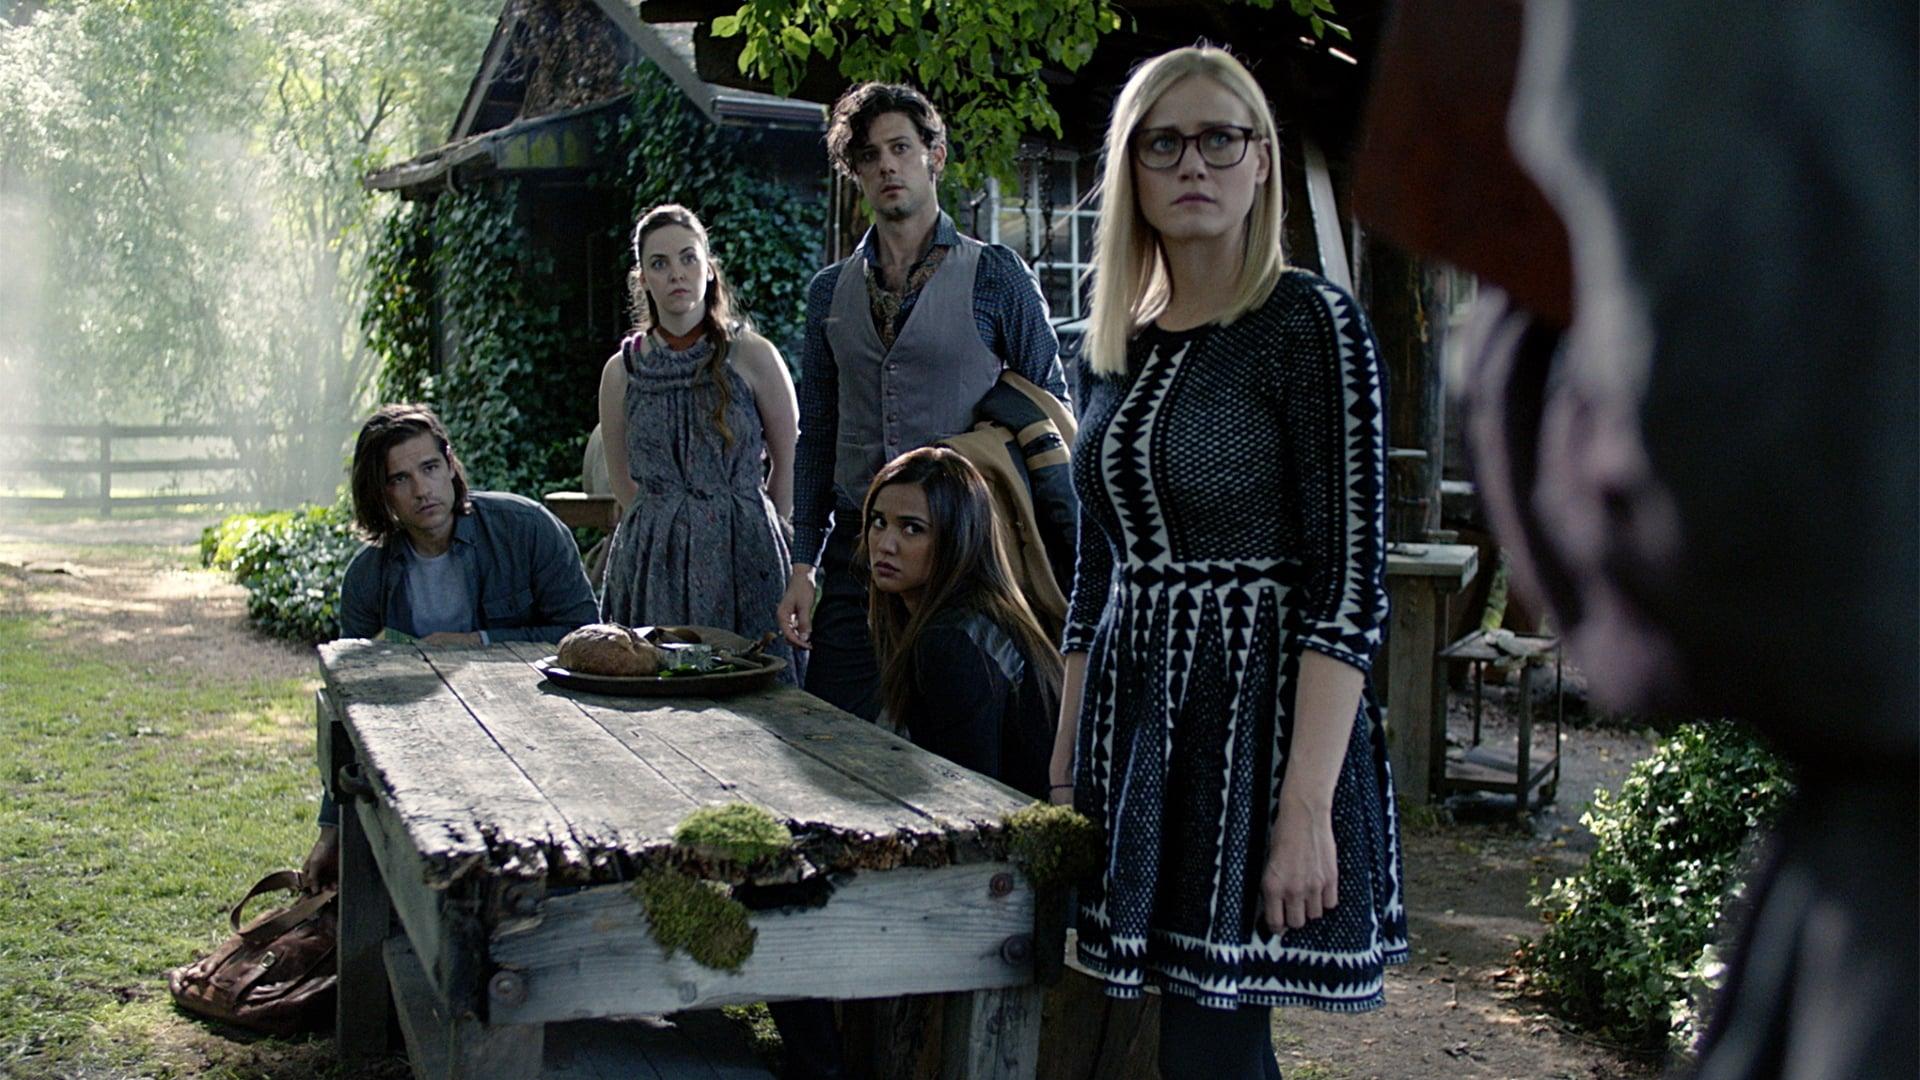 watch The Magicians Season 2 Episode 1 online free